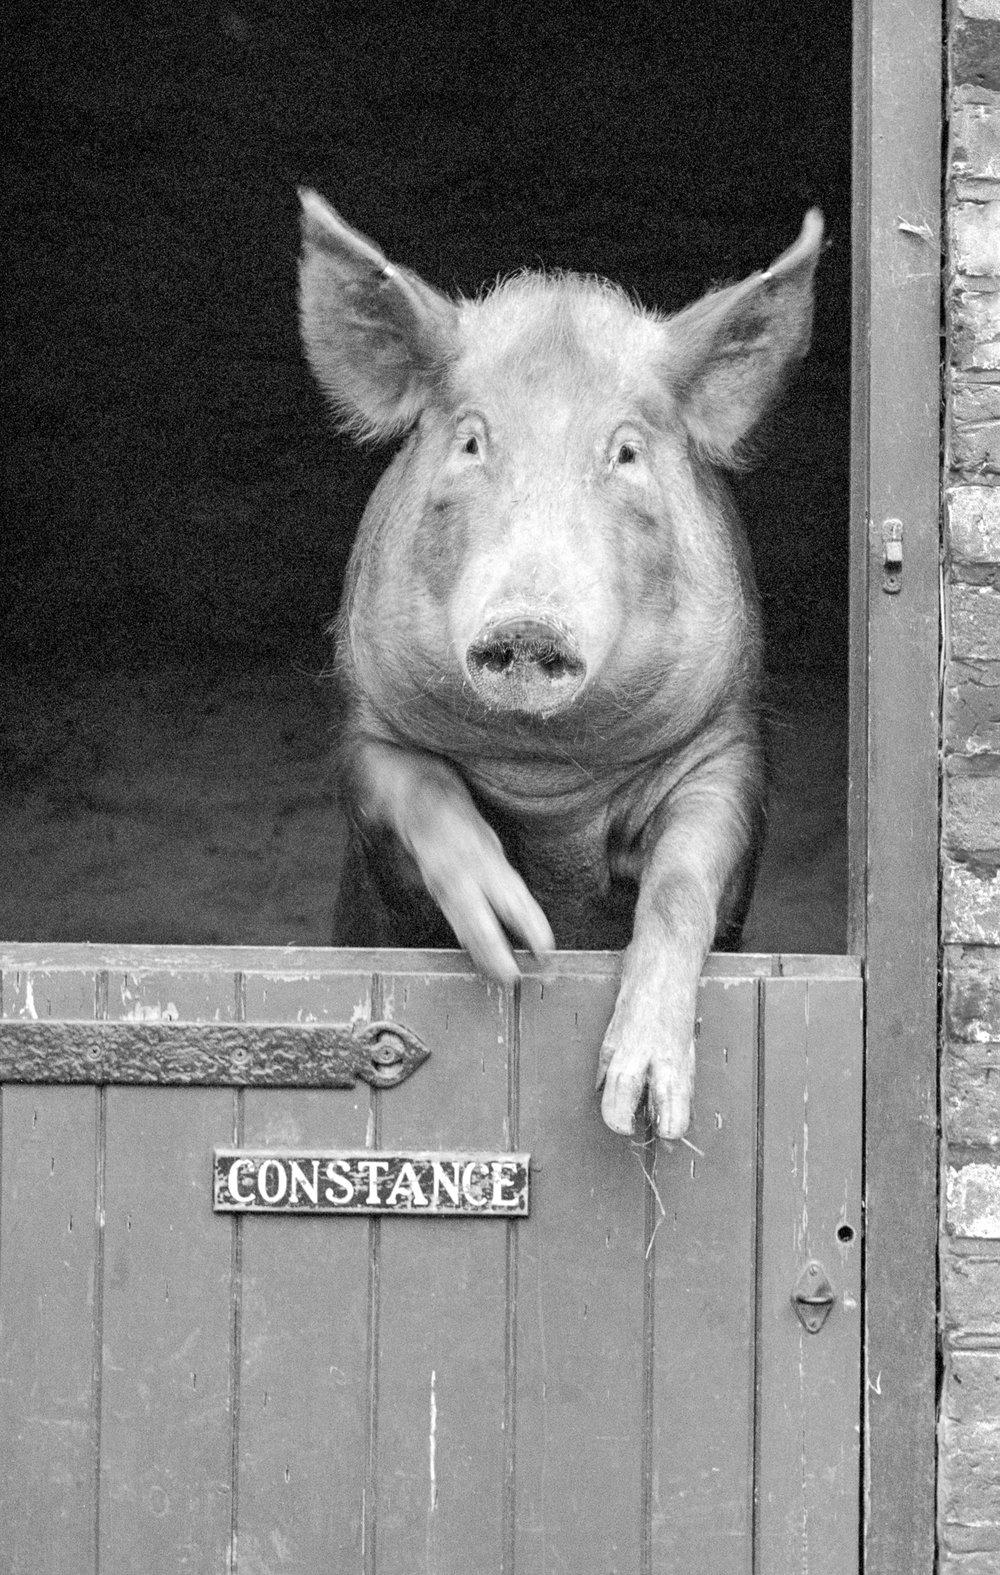 Miss P Constance The Tamworth Pig Macfilos